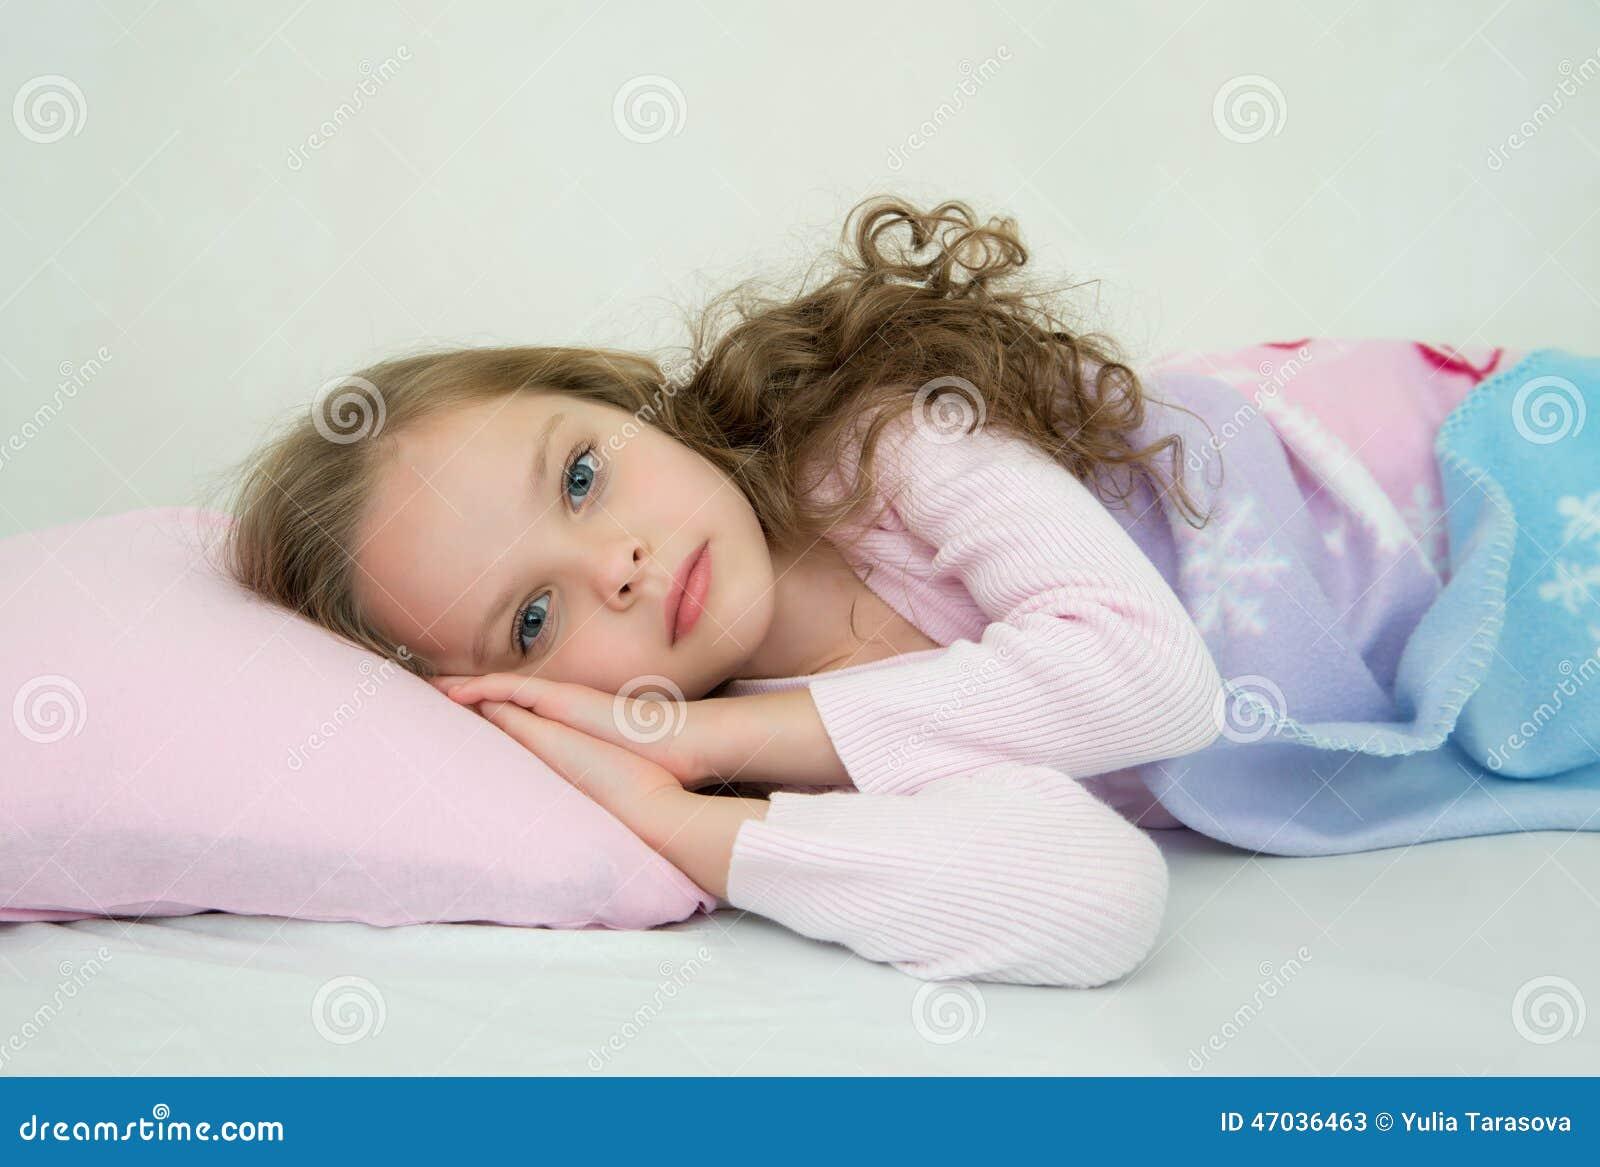 of girl Film fucking sleeping